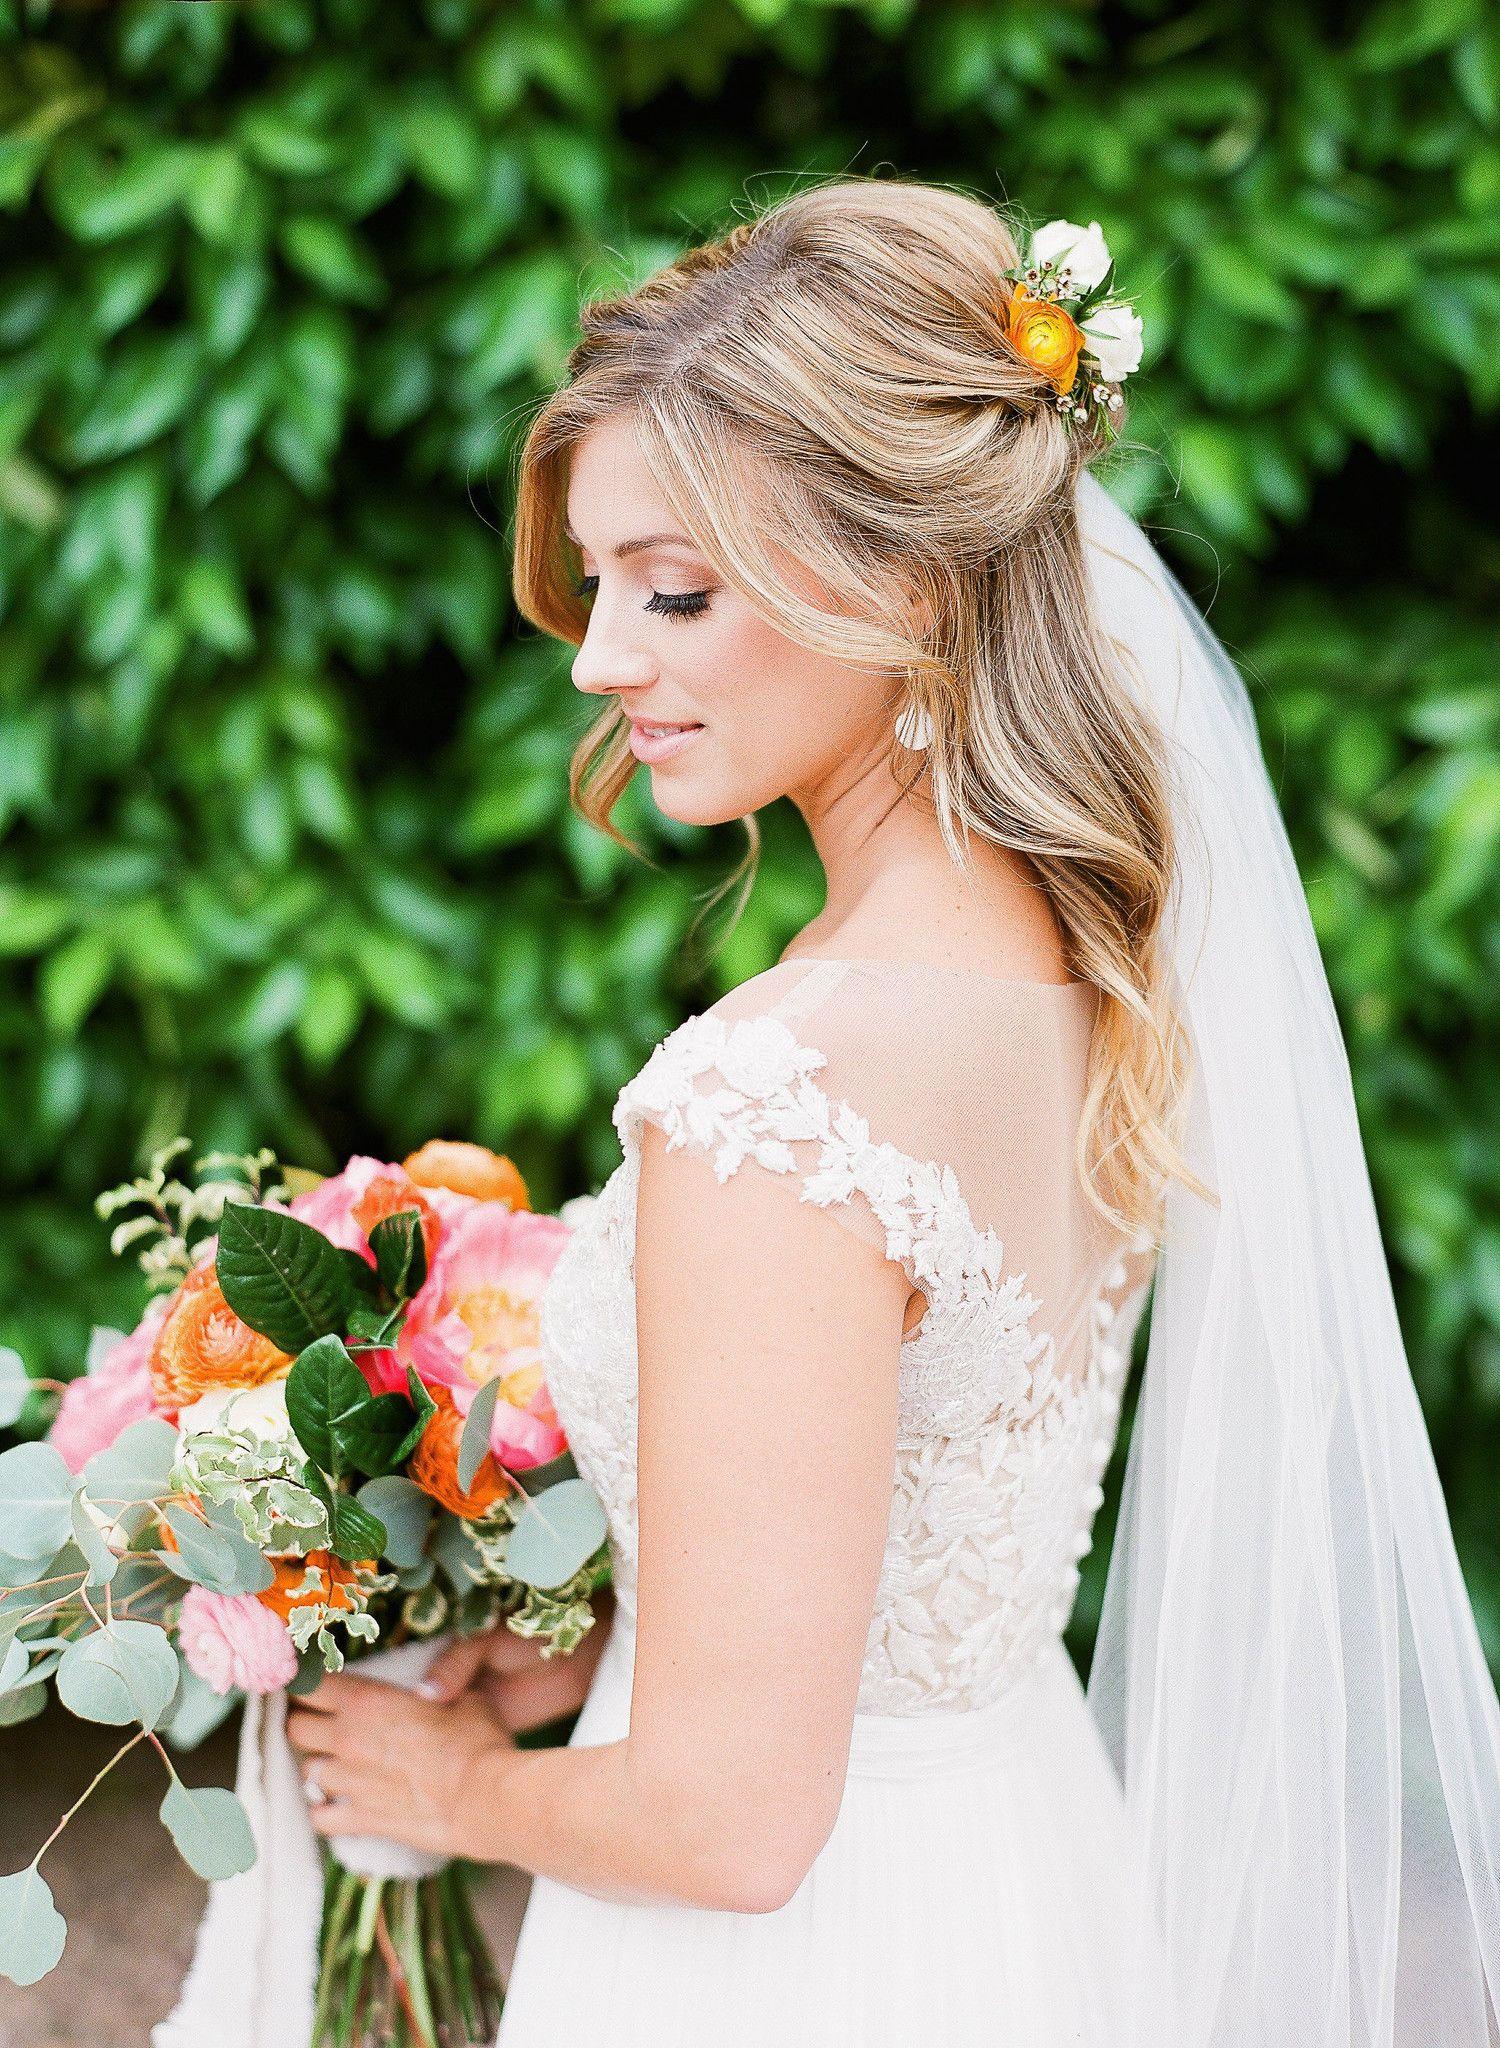 Pin by lilia todorova on wedding hair pinterest weddings and wedding